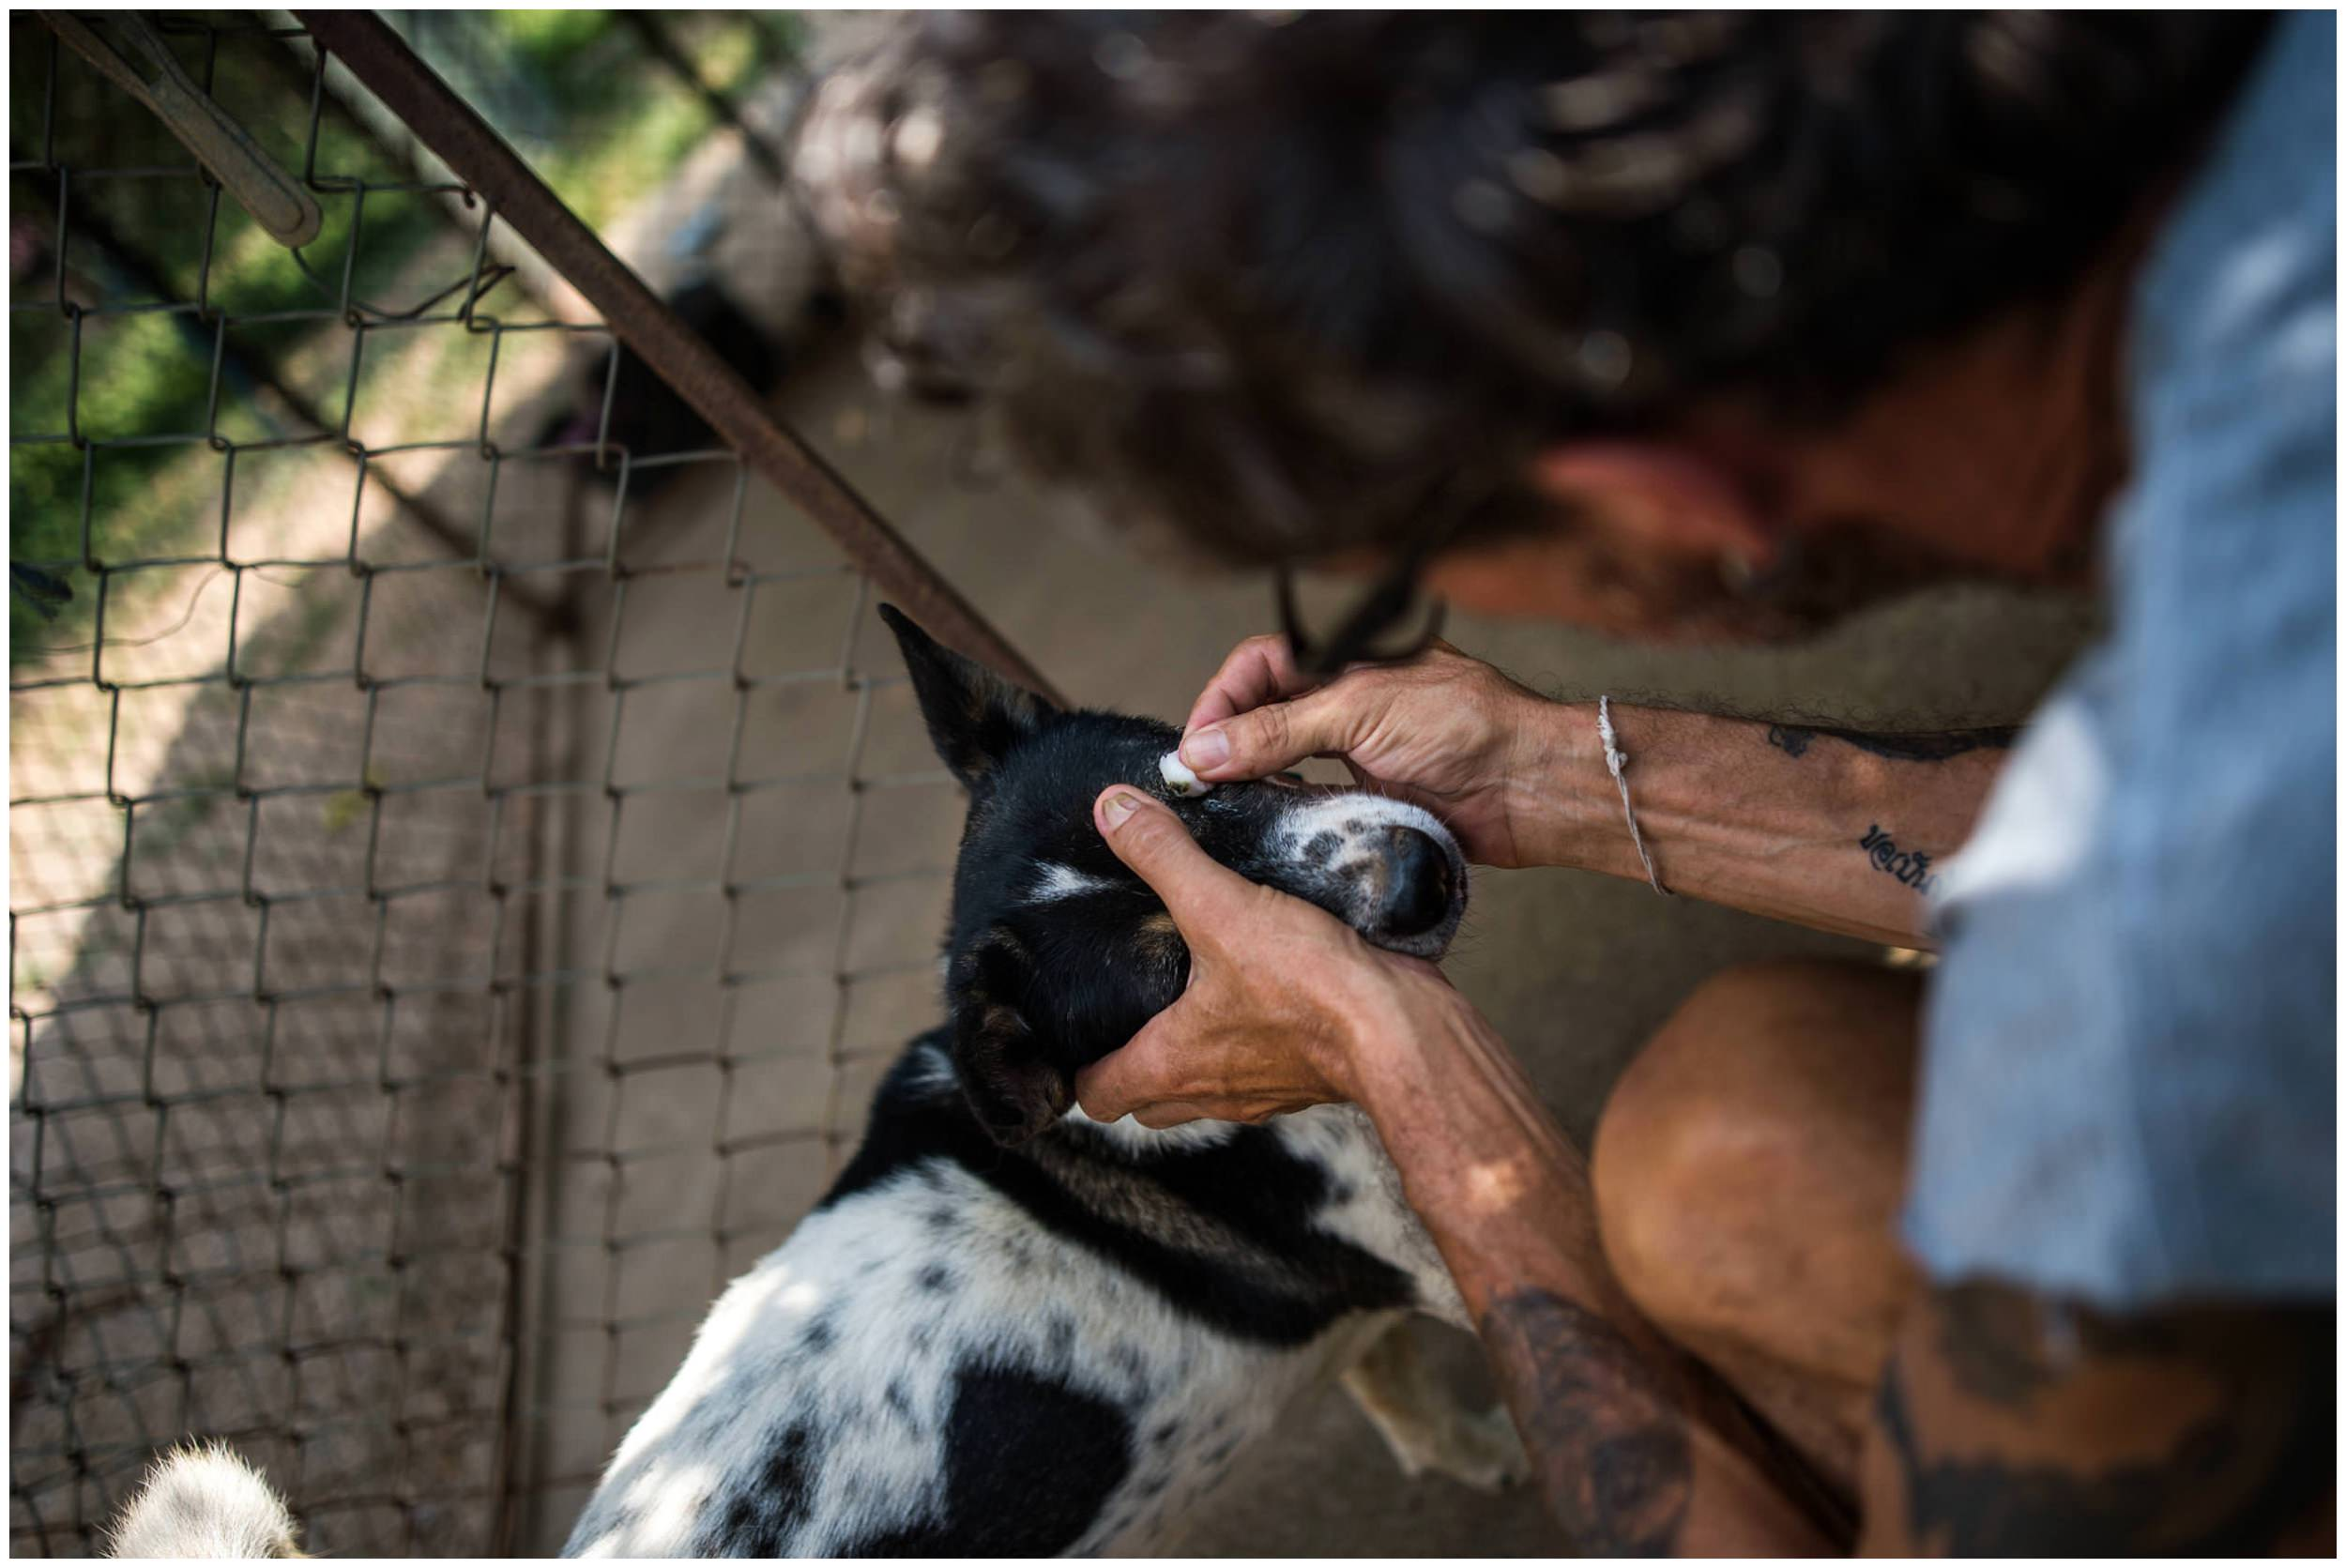 Headrock, dogs, shelter, rescue, people, hands, compassion, care, bang saphan, thailand, honden, straathonden, opvangcentrum, rehabilitatie, rehabilitation, asiel, verzorging, compassie, franz thomi, franziska thomi